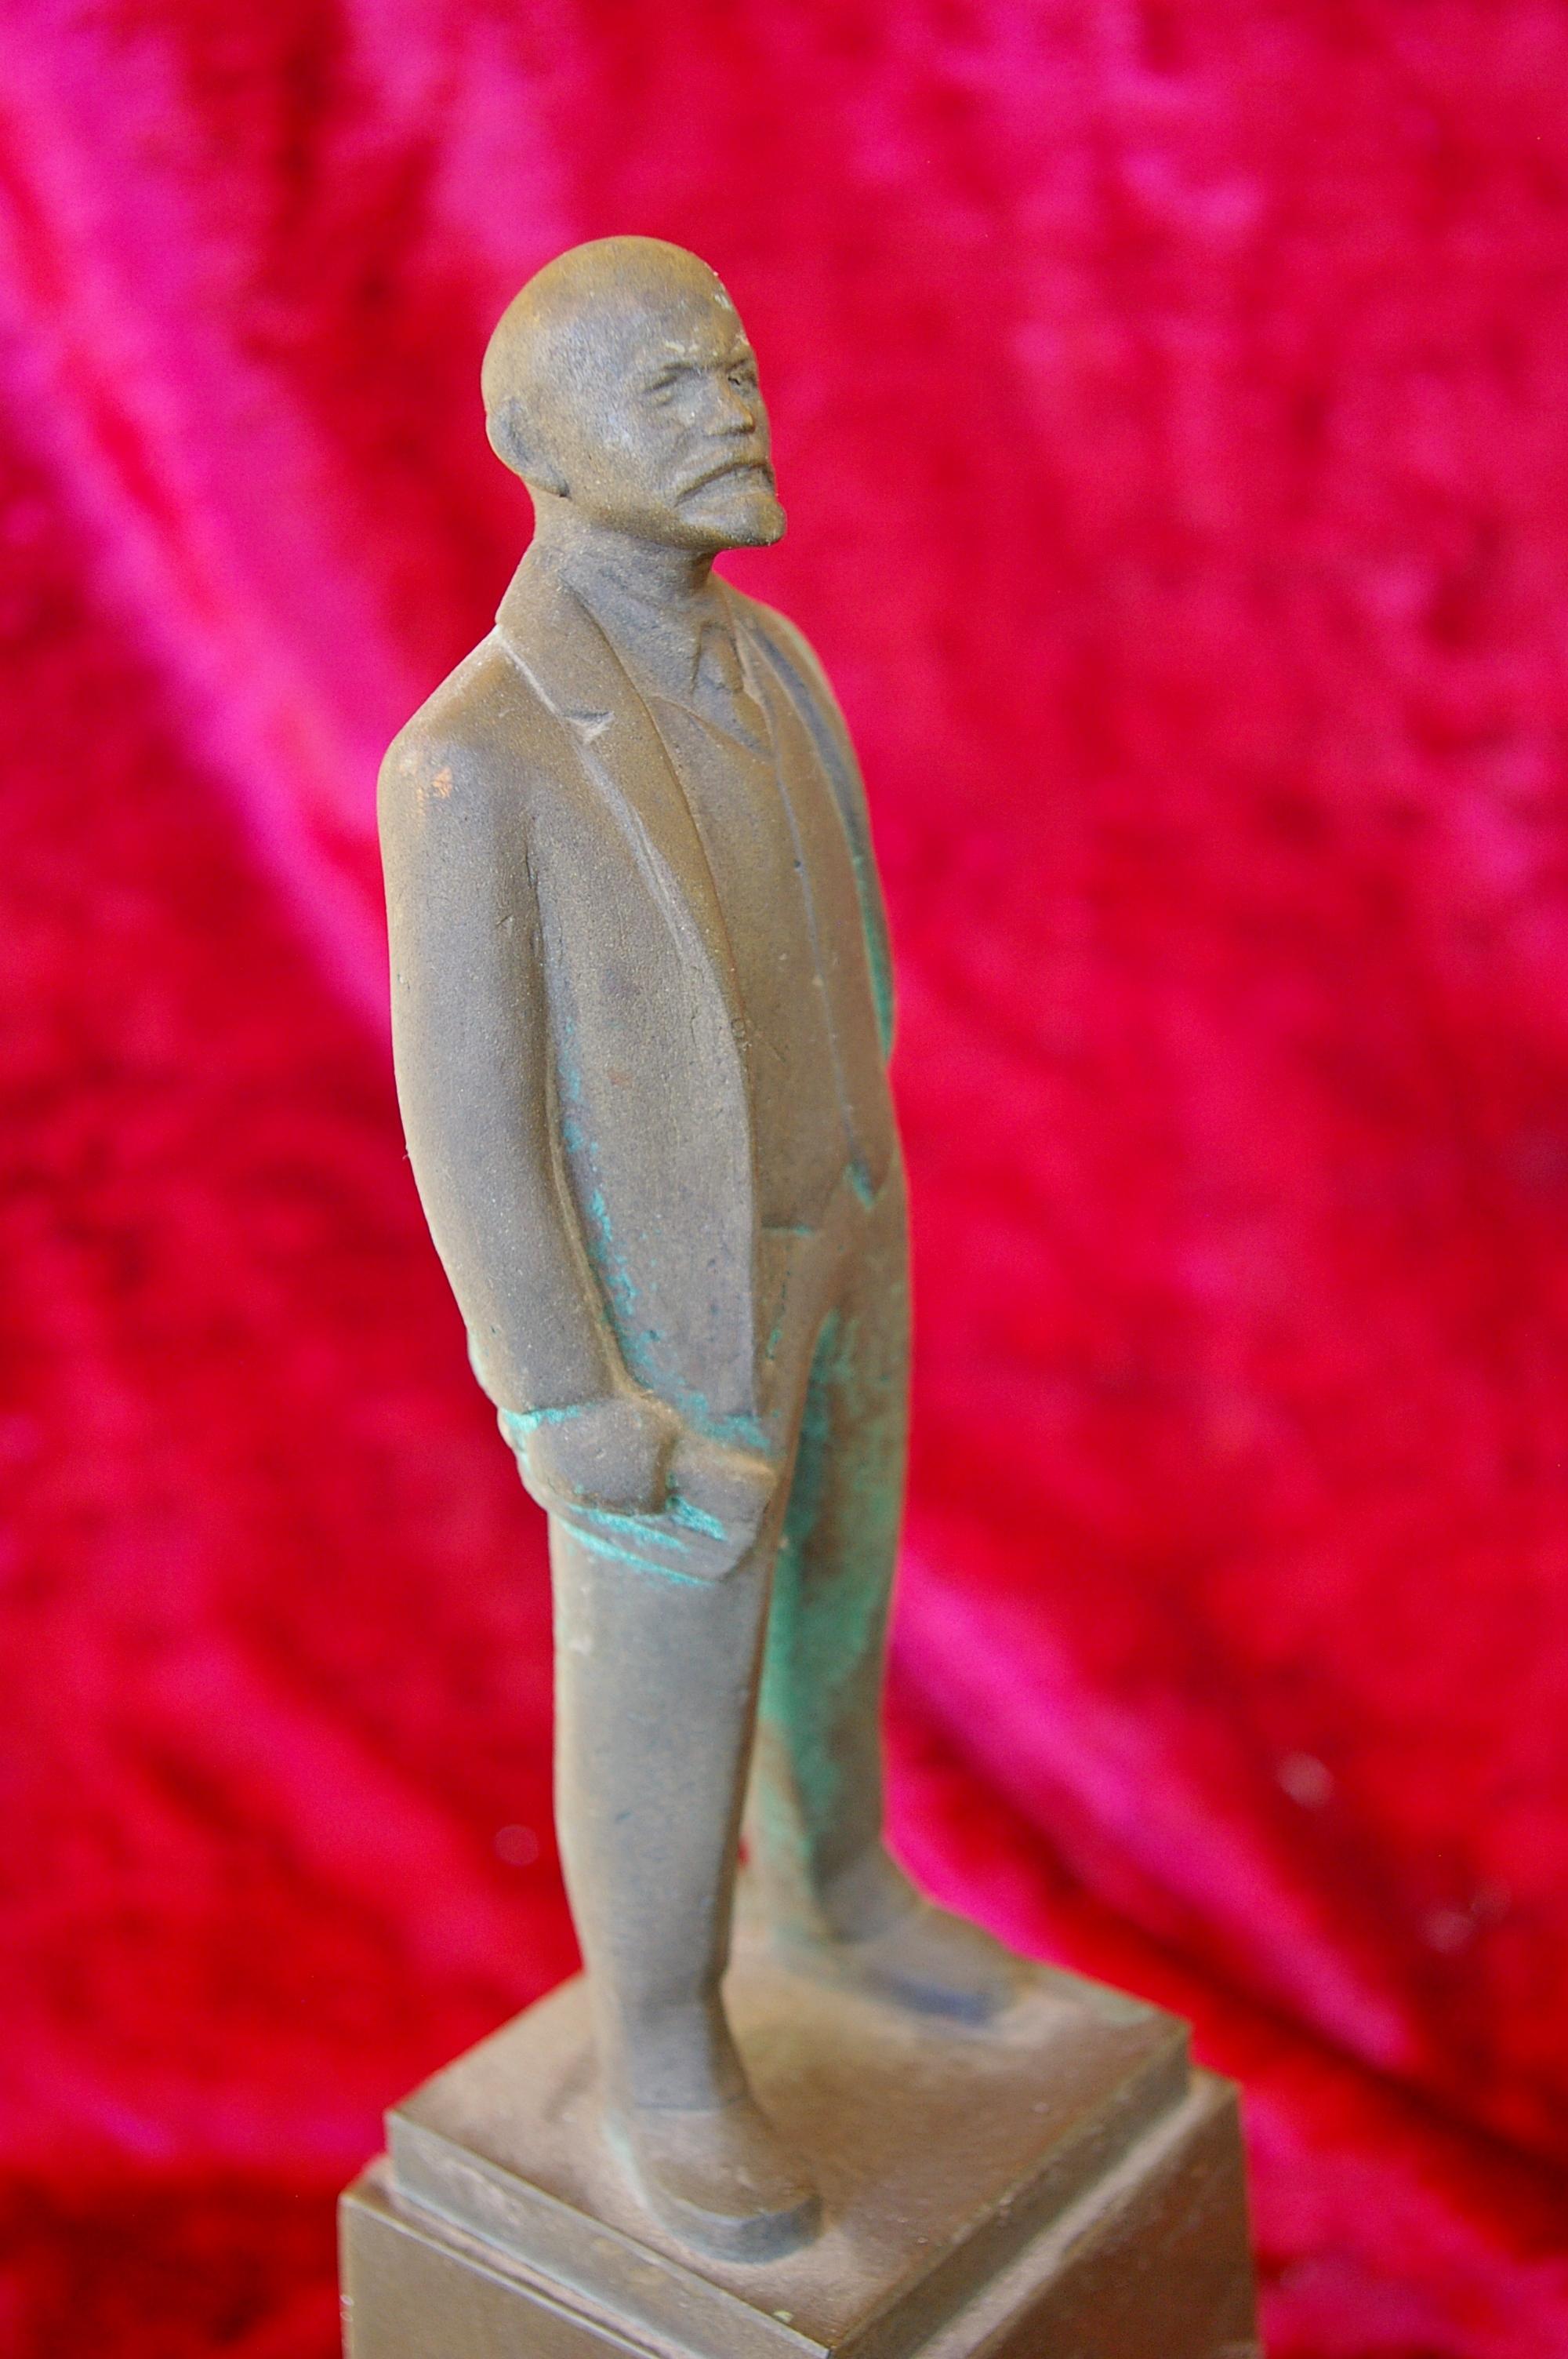 Скульптура Ленин на постаменте, материал бронза, высота 35 см., ширина 20 см., длина 20 см. - 6